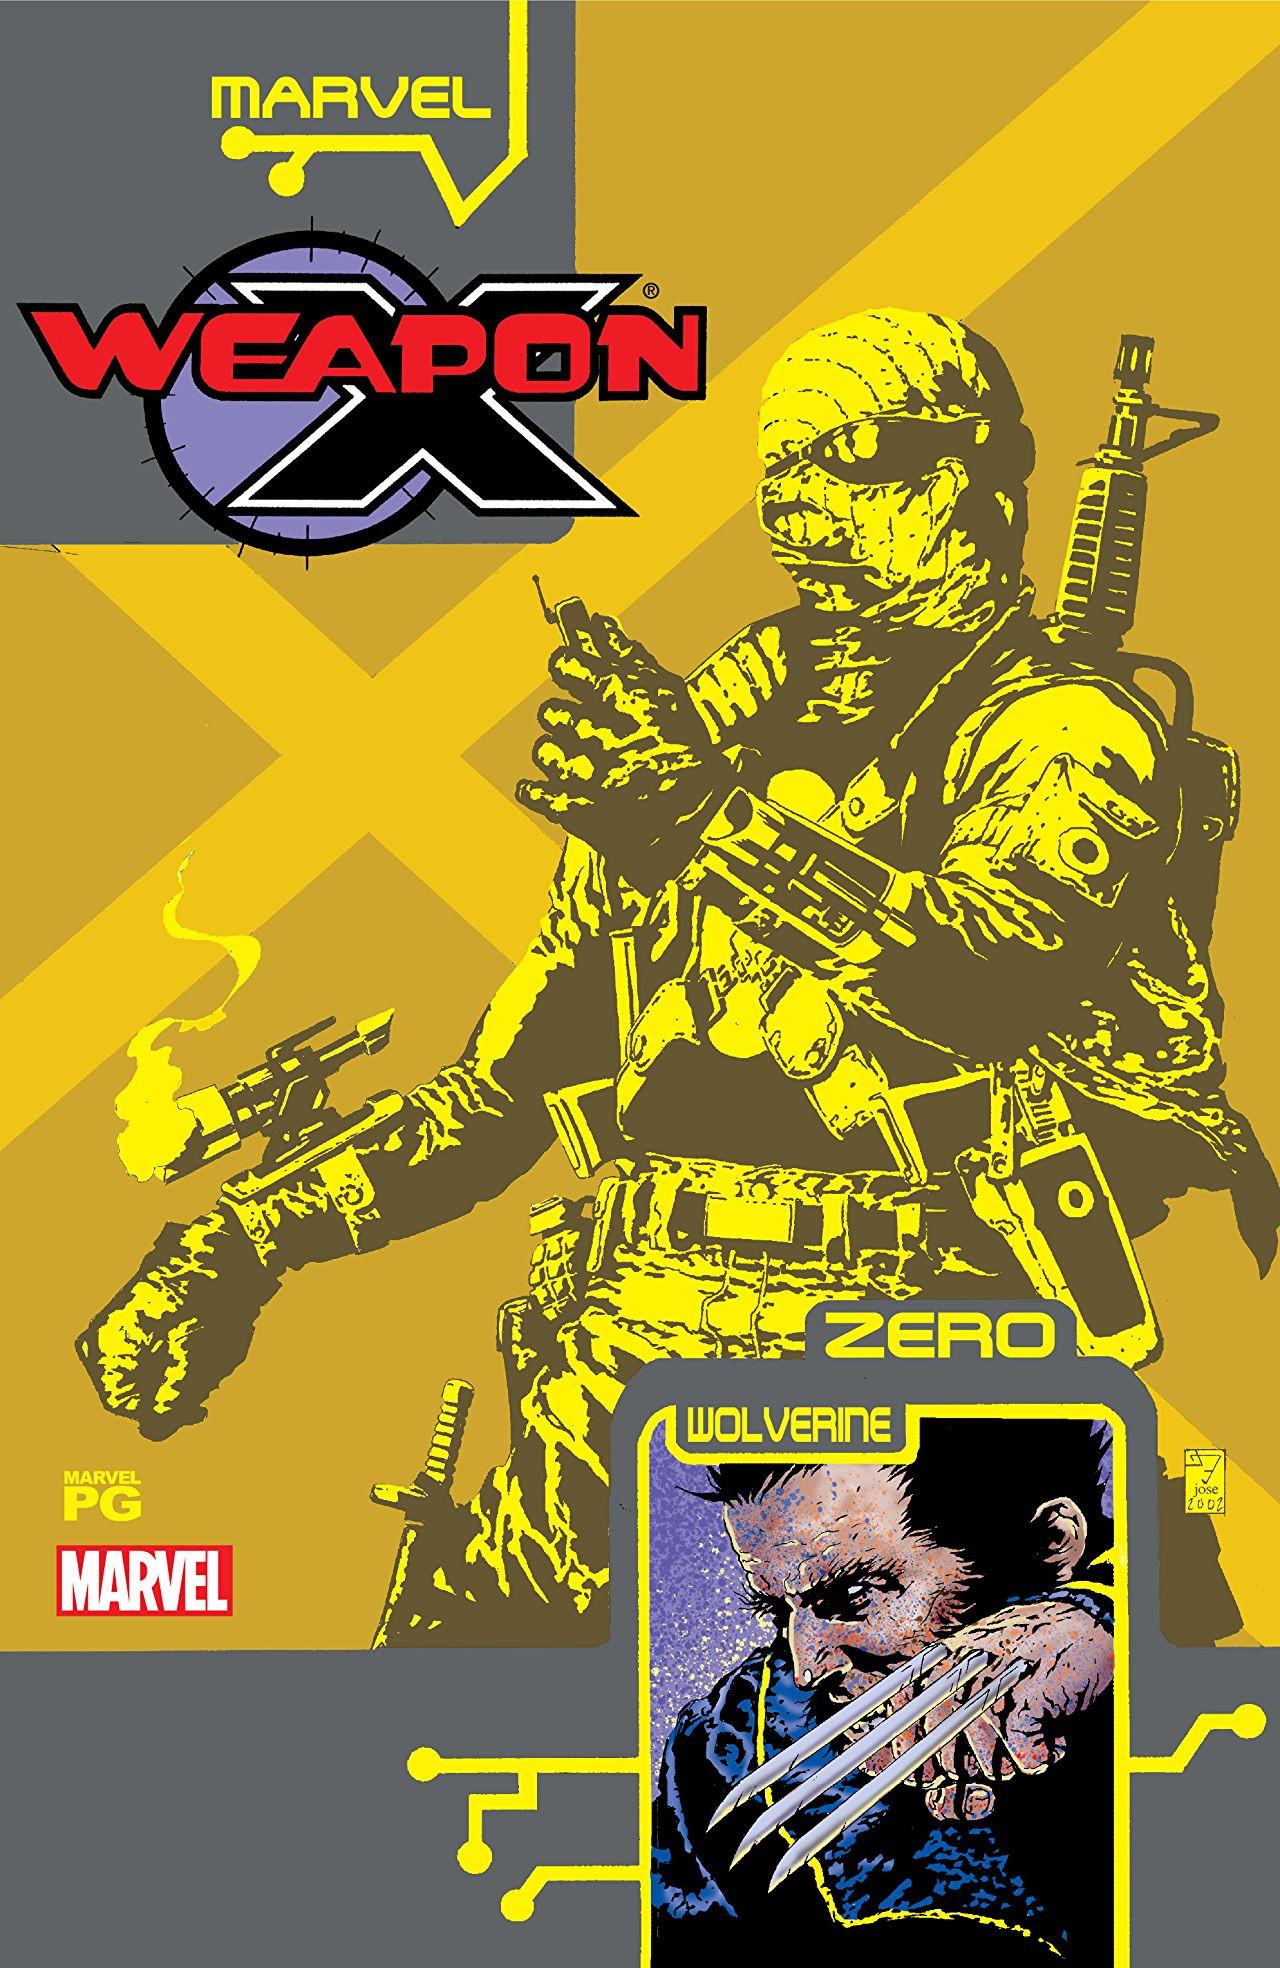 Weapon X: The Draft - Agent Zero Vol 1